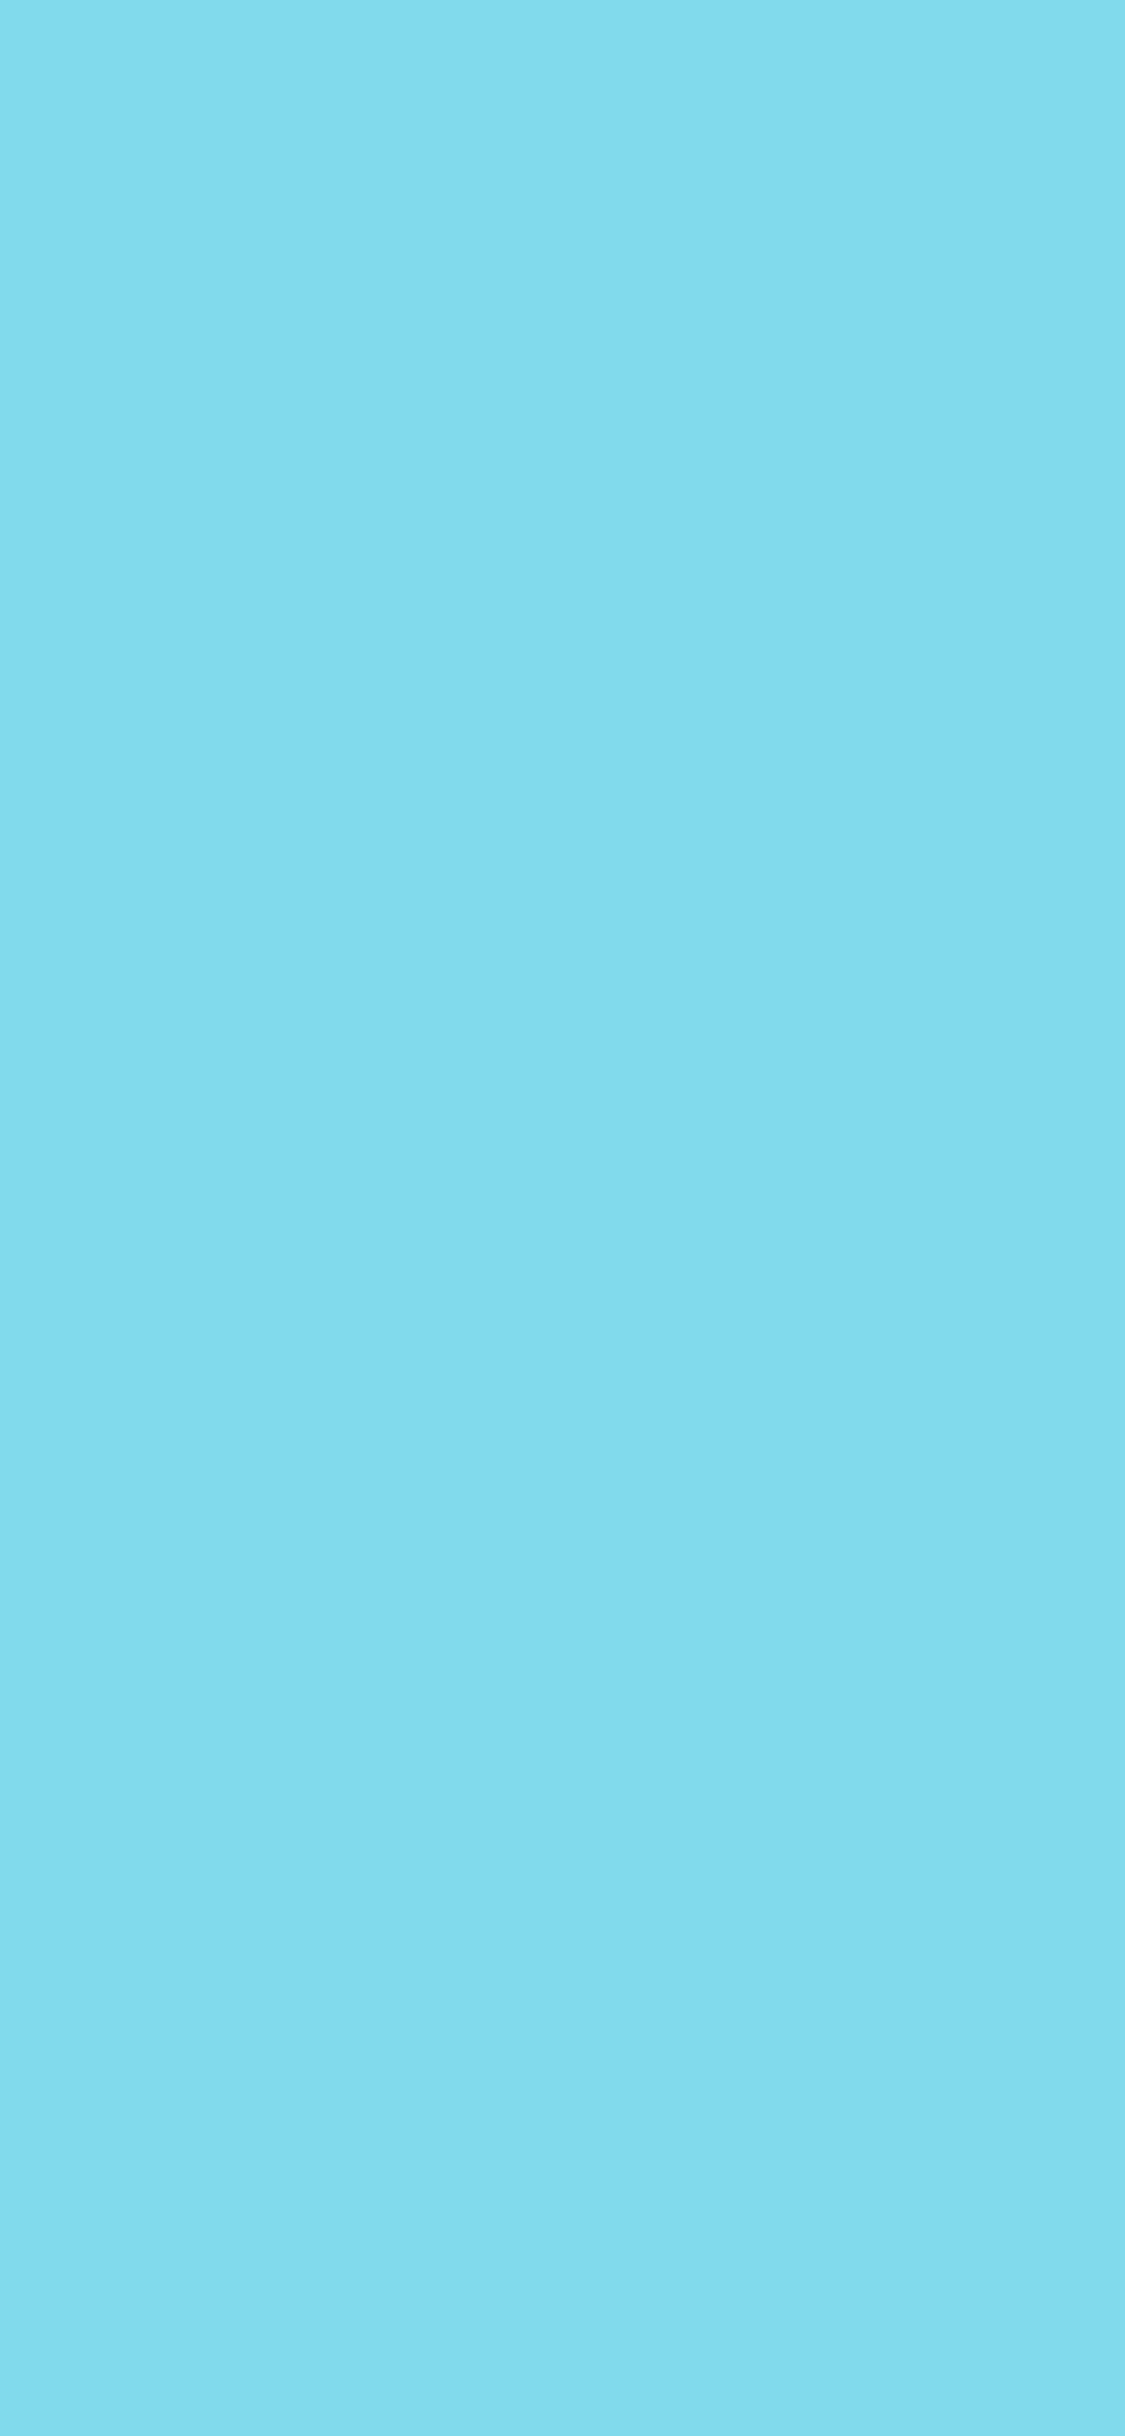 1125x2436 Medium Sky Blue Solid Color Background